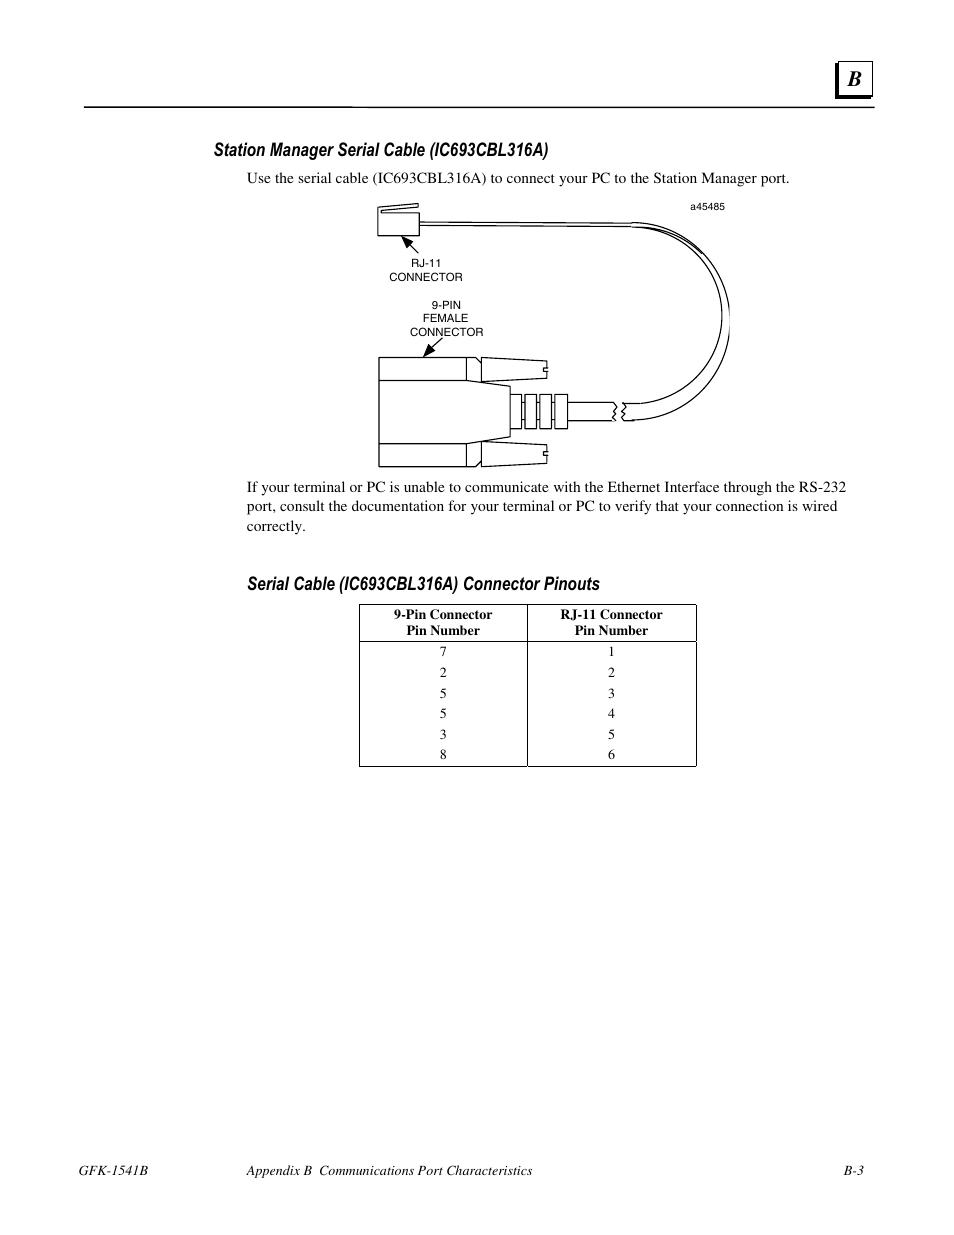 FANUC Robotics America GFK-1541B User Manual   Page 204 / 240 on